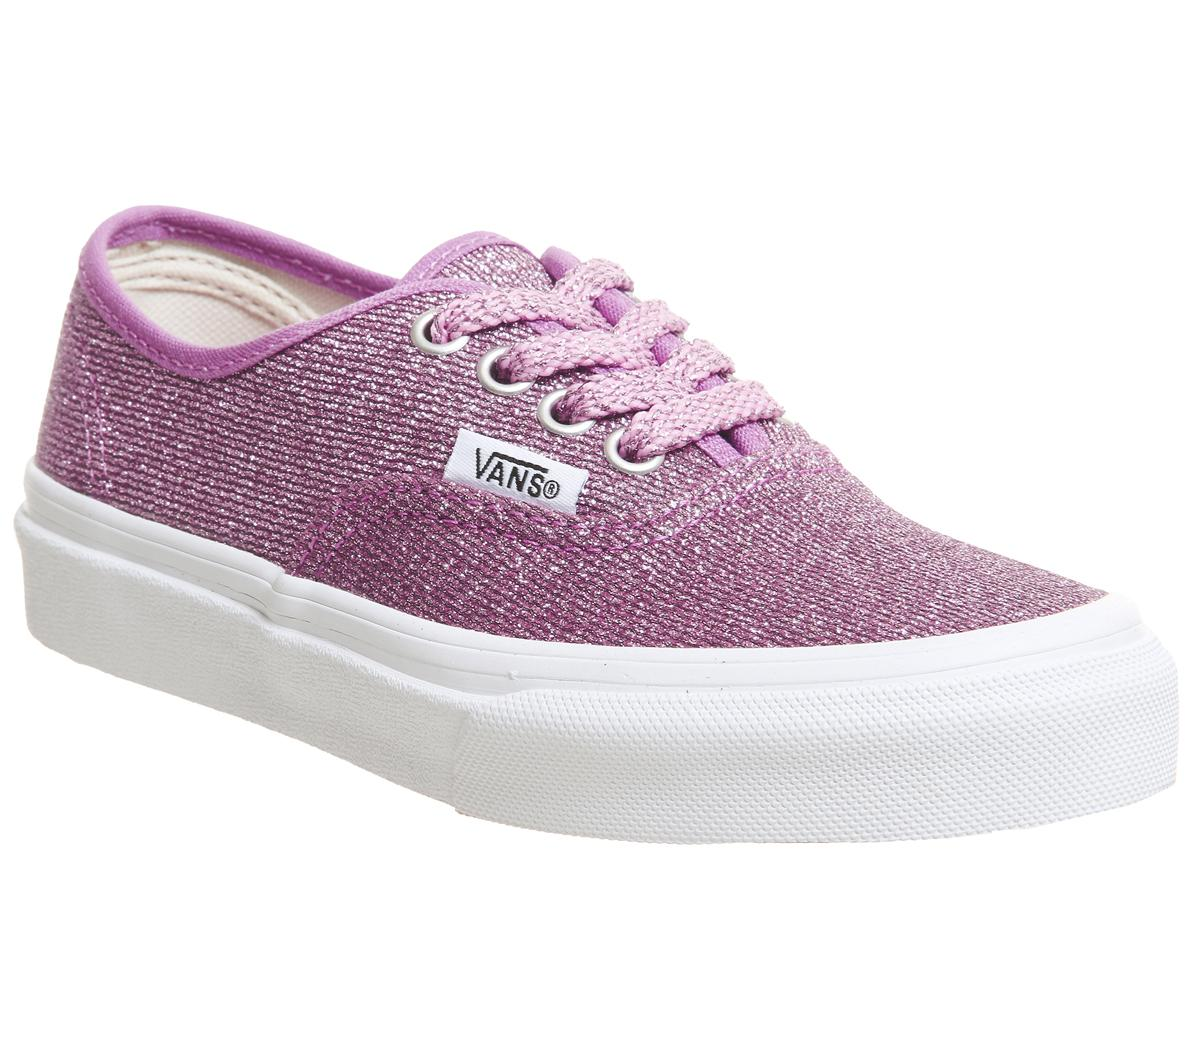 Vans Authentic Kids Trainers Pink True